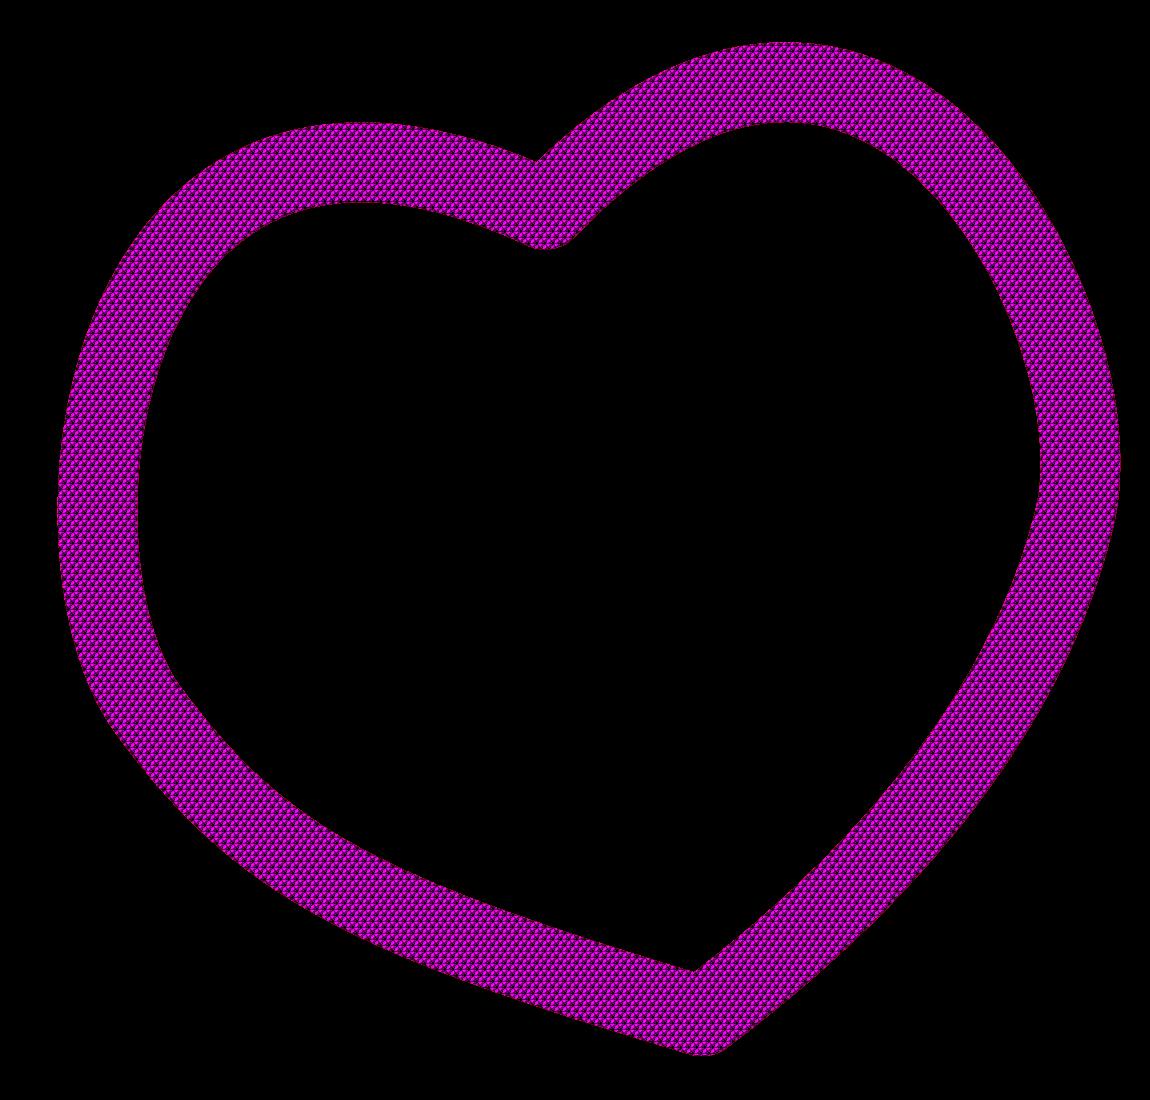 1150x1100 Purple Heart Clip Art Clipart Panda